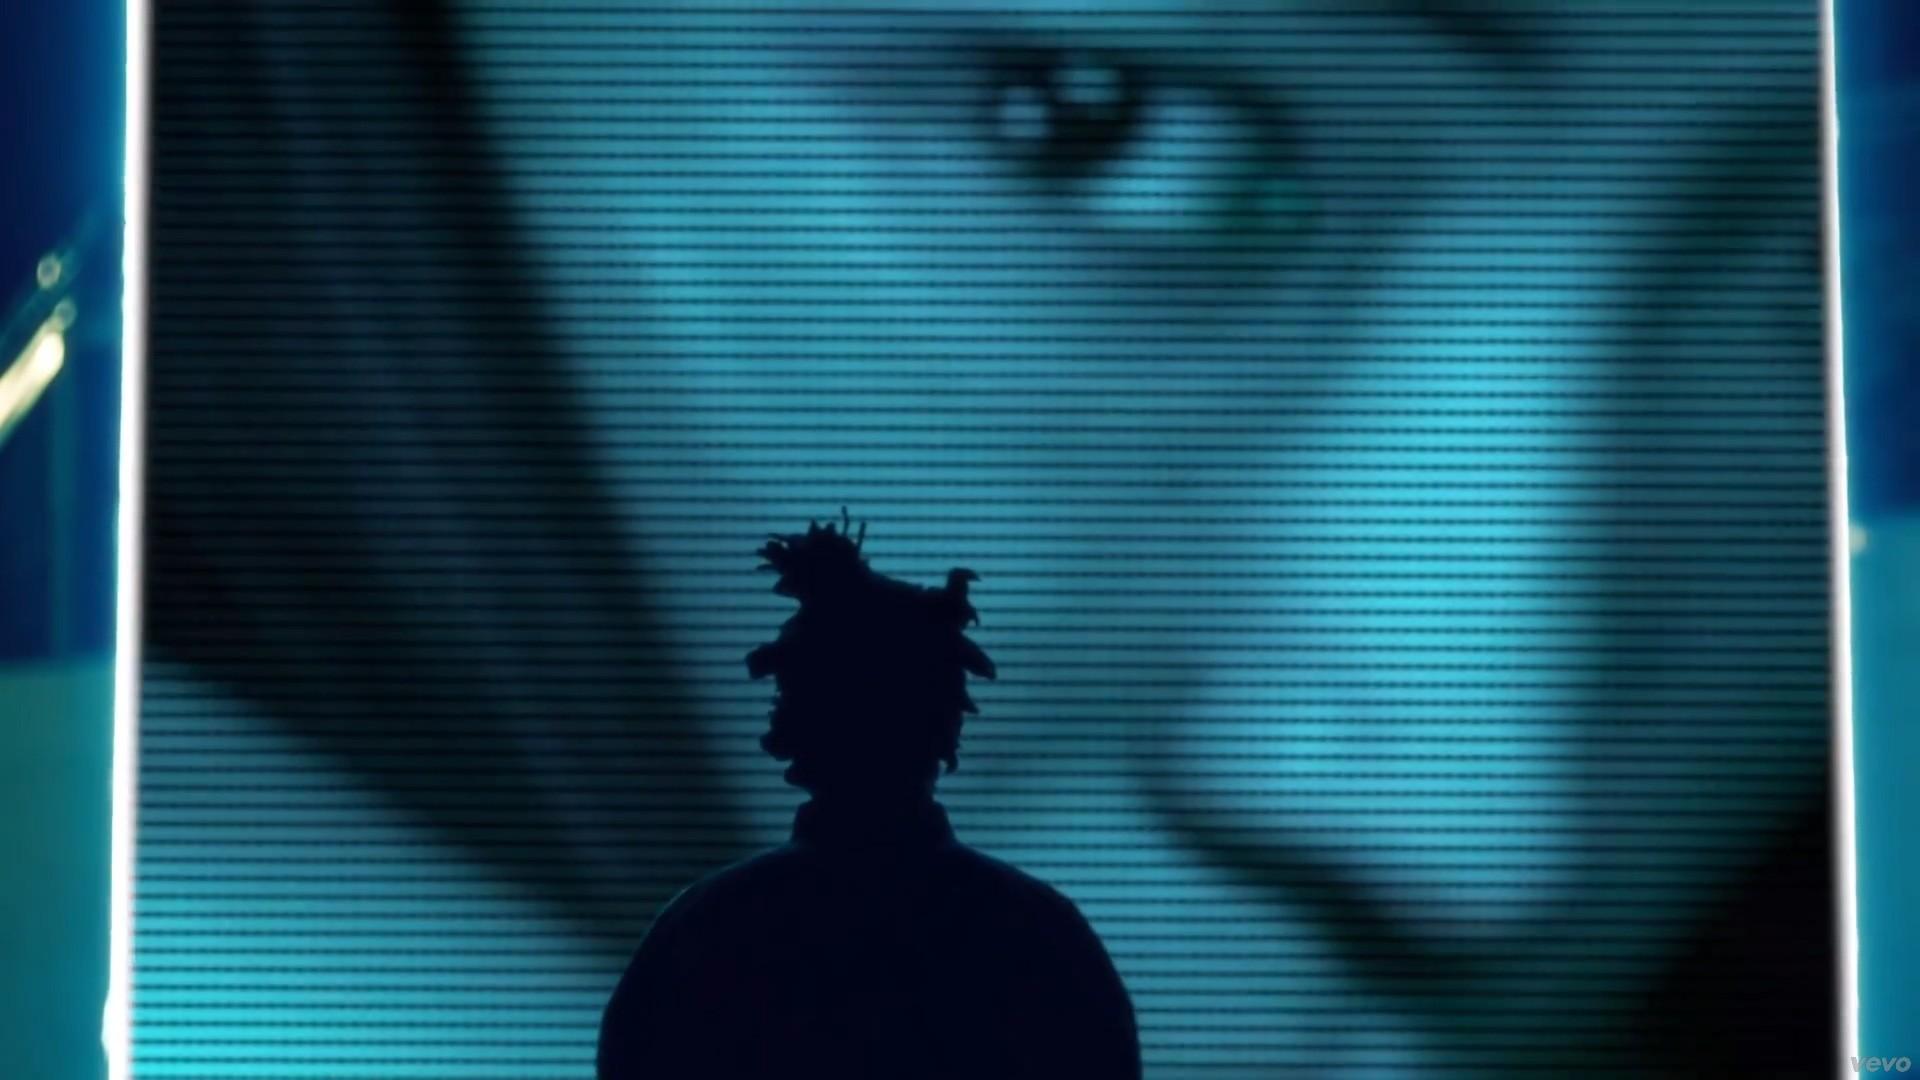 … https://www.fubiz.net/wp-content/uploads/2013/07/The-Weeknd-Belong-To-The -World8.jpg